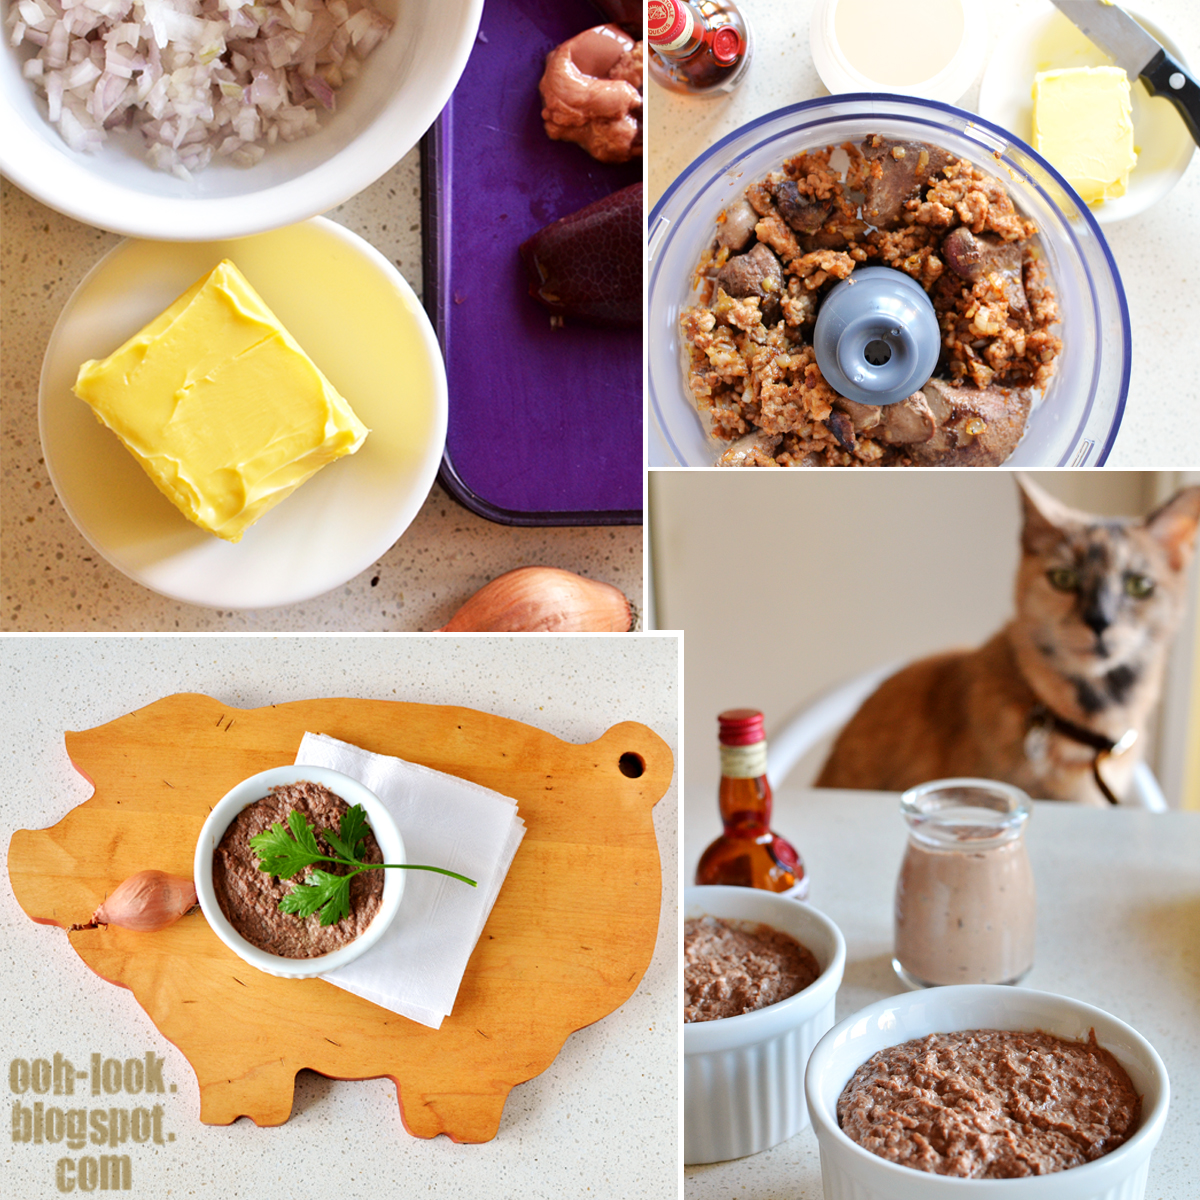 Ooh look vietnamese chicken pork liver pt and a bad cat vietnamese chicken pork liver pt and a bad cat forumfinder Gallery